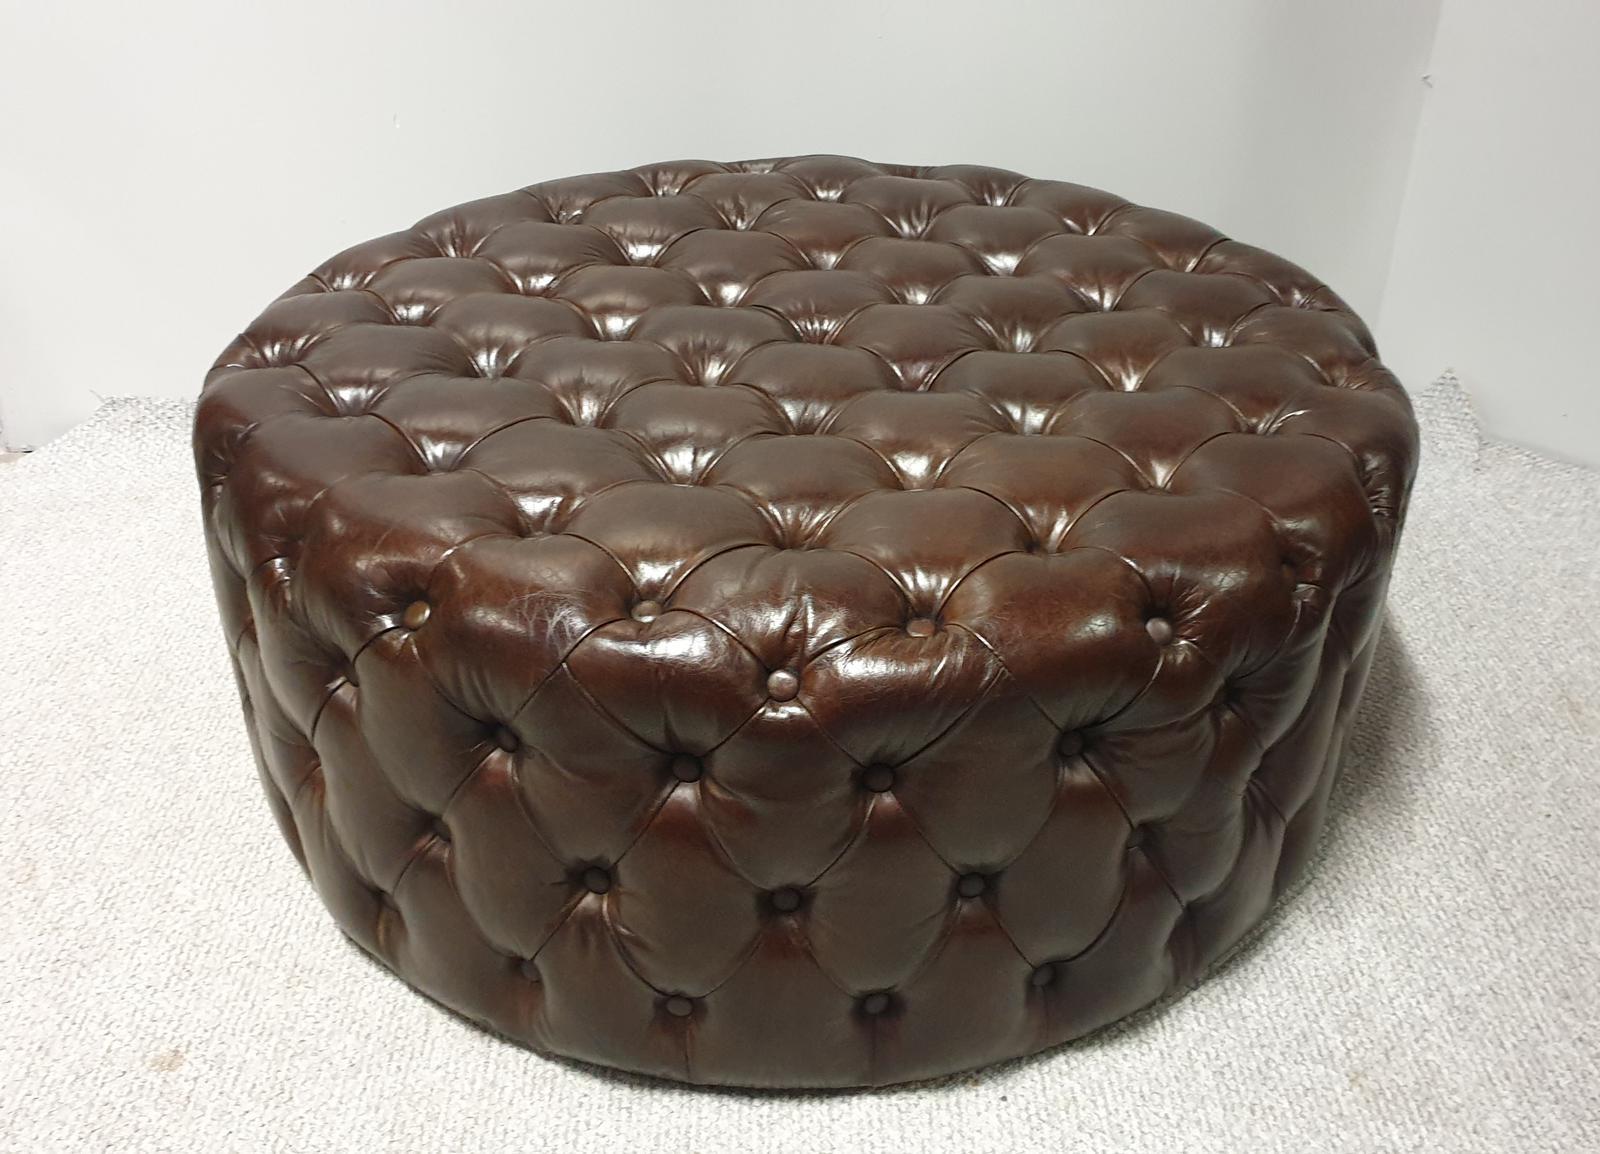 Large Round Leather Stool (1 of 1)